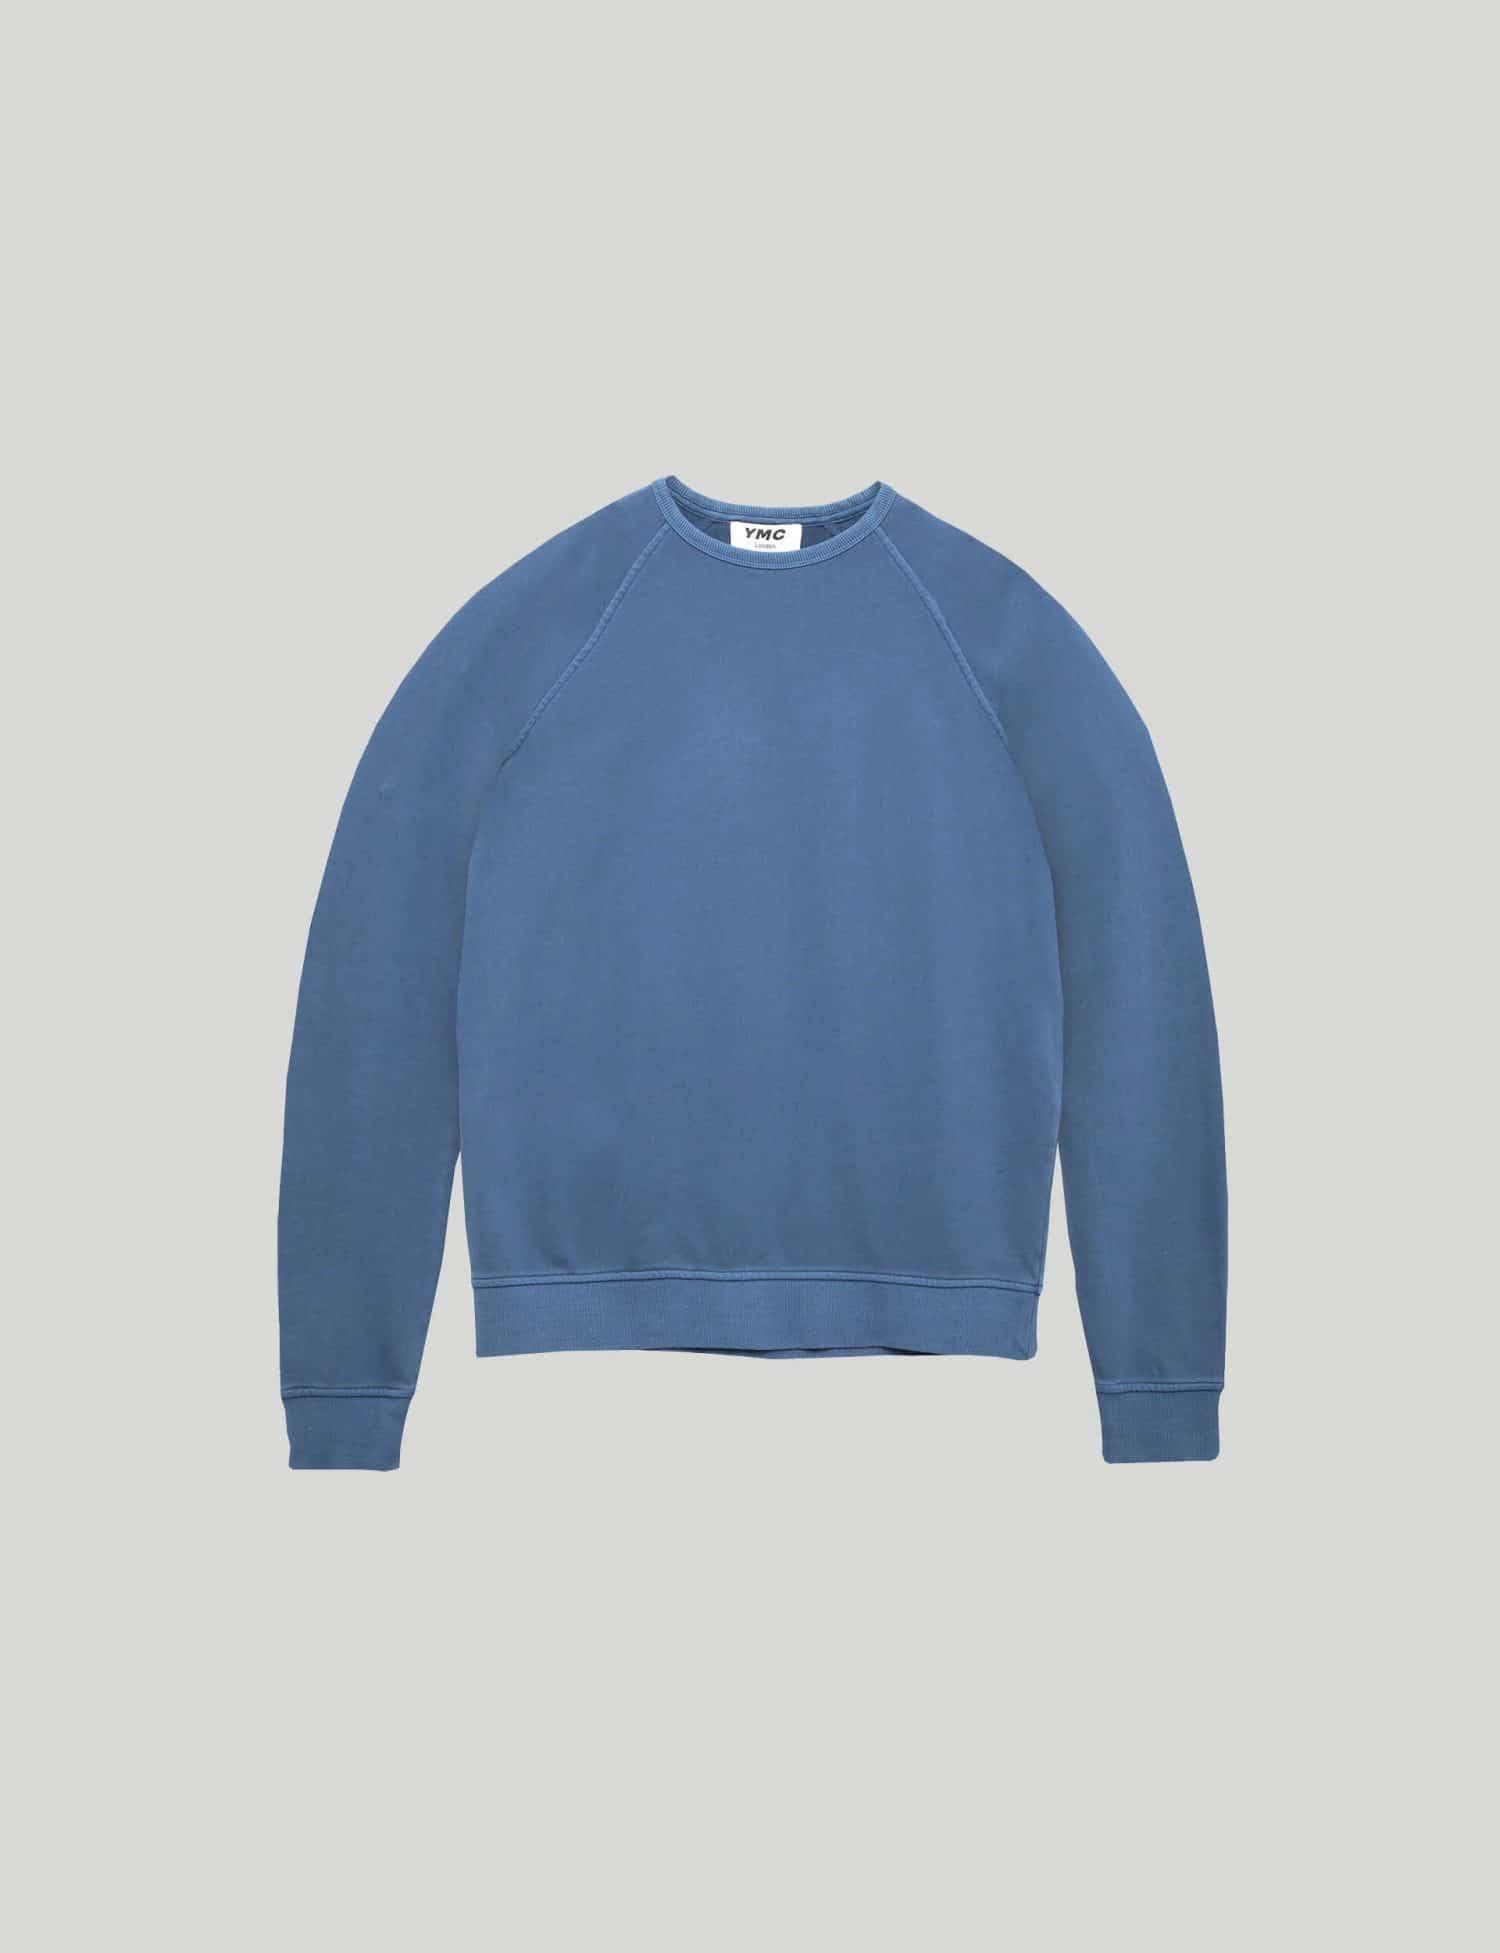 YMC - Schrank Raglan Sweatshirt - Blue